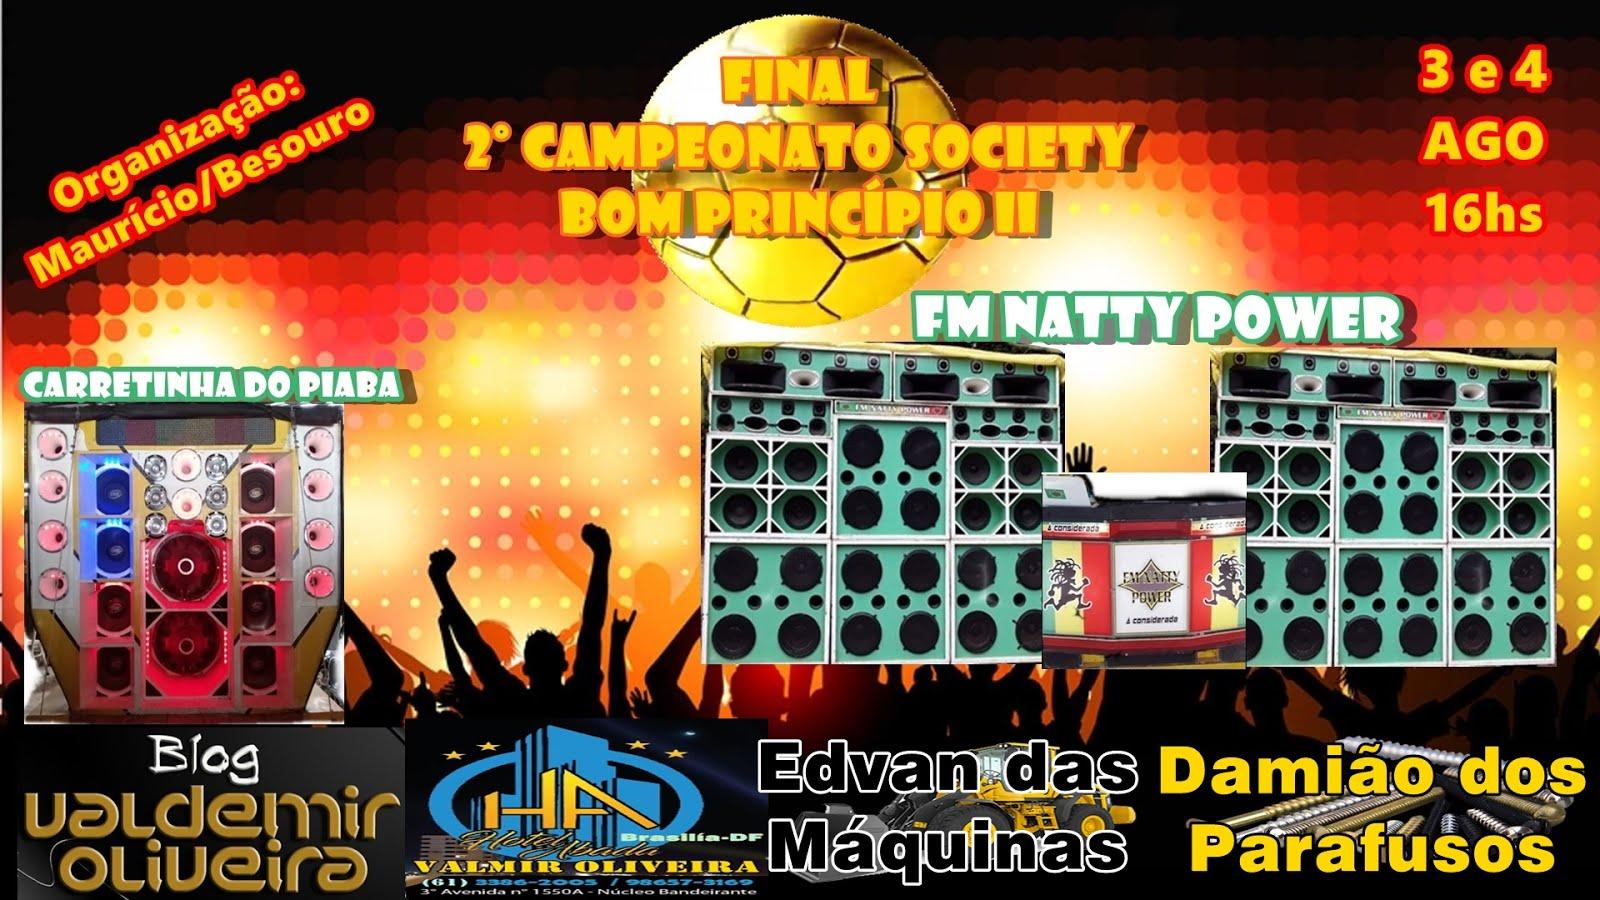 Final do 2° Campeonato Society